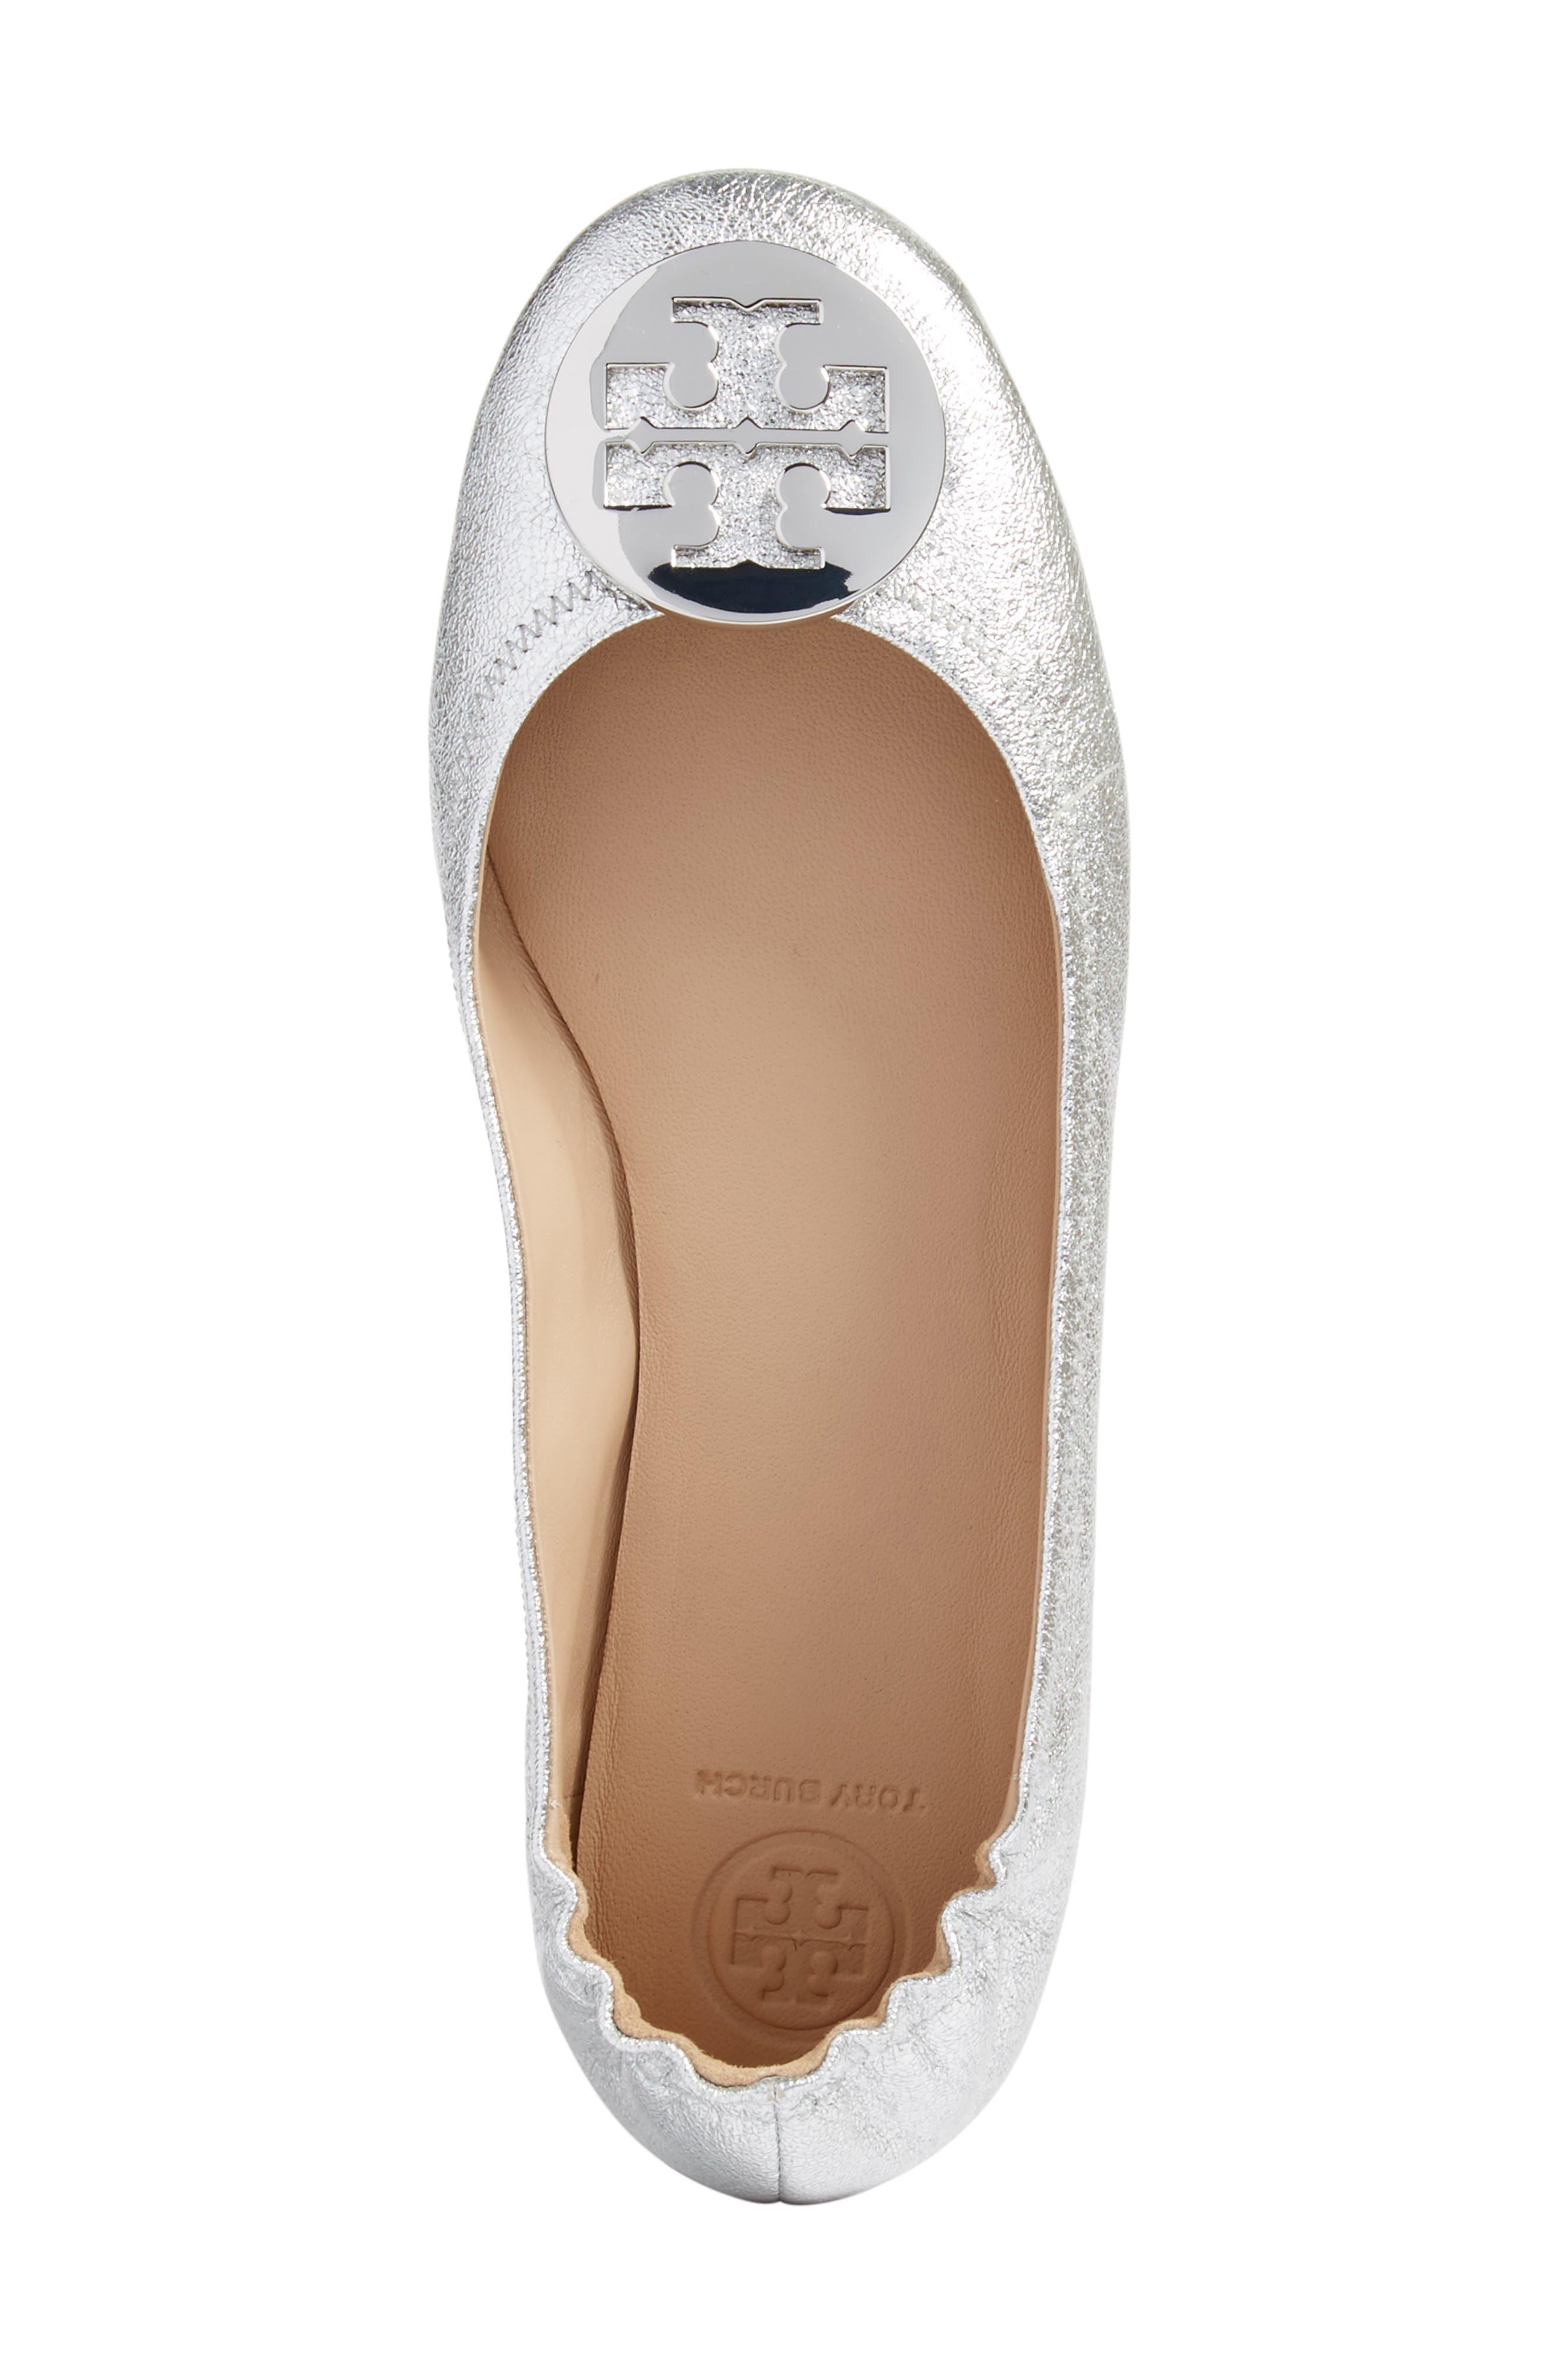 'Minnie' Travel Ballet Flat,                             Alternate thumbnail 244, color,